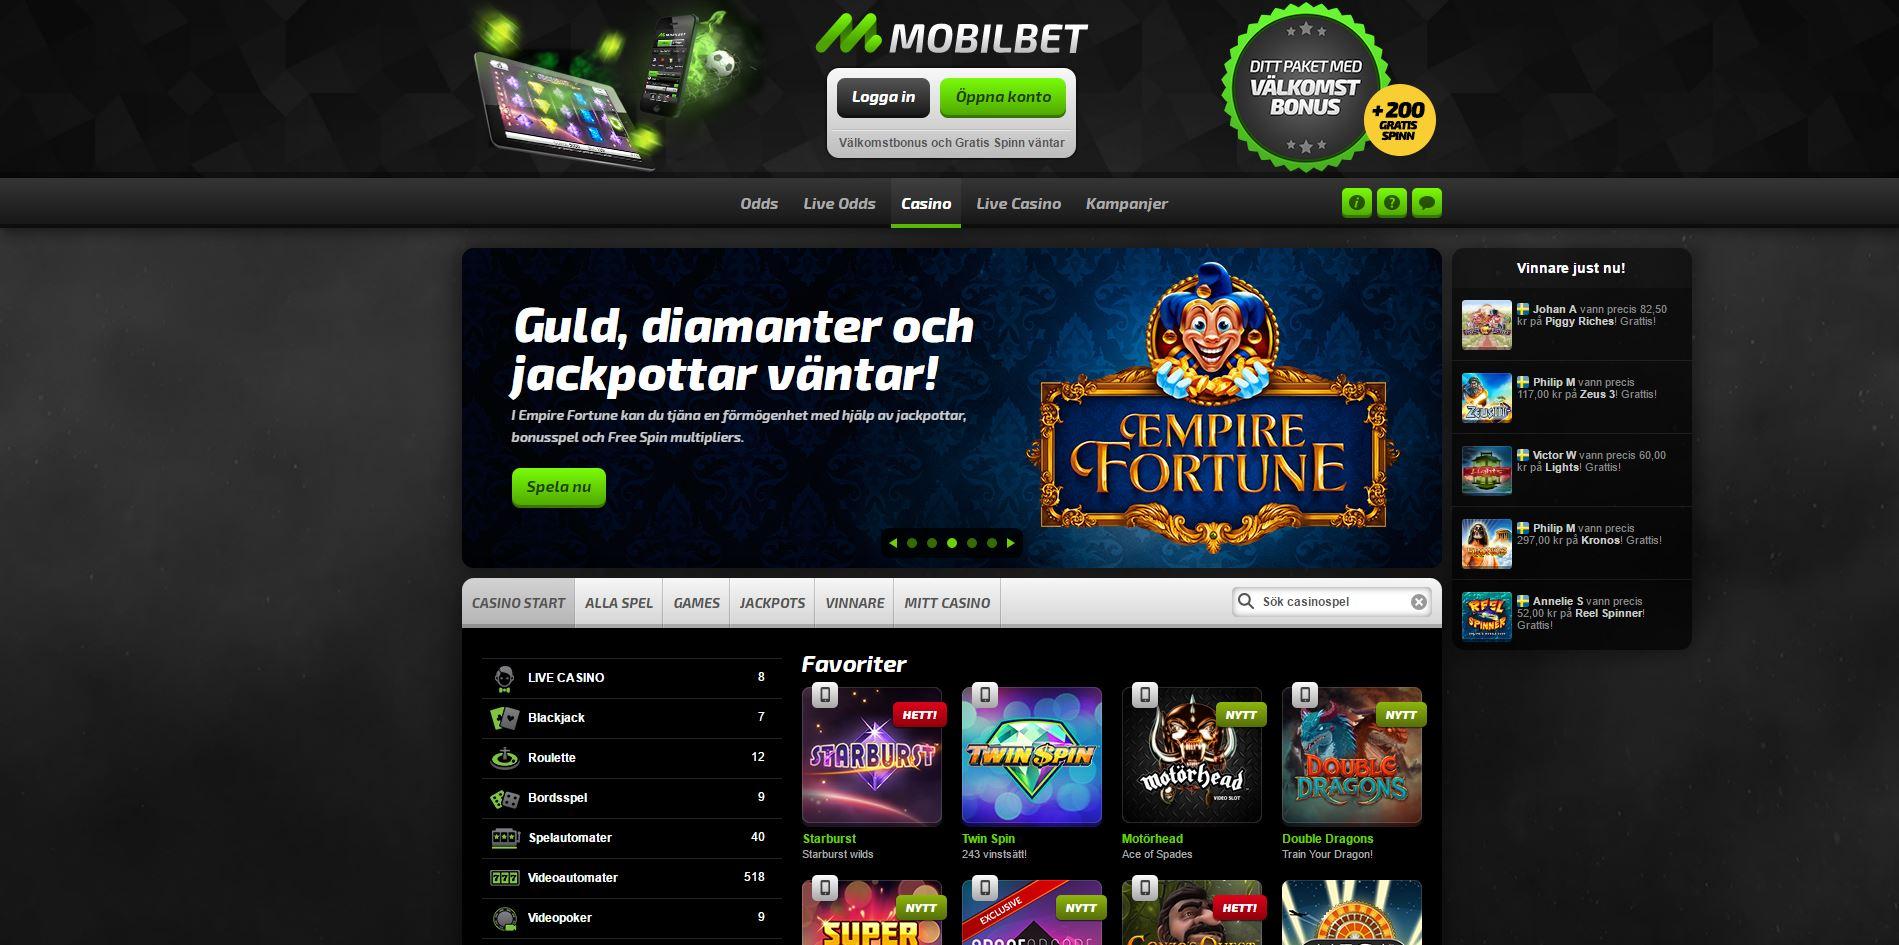 PlayHippo bonus € bono casino betsson-561820